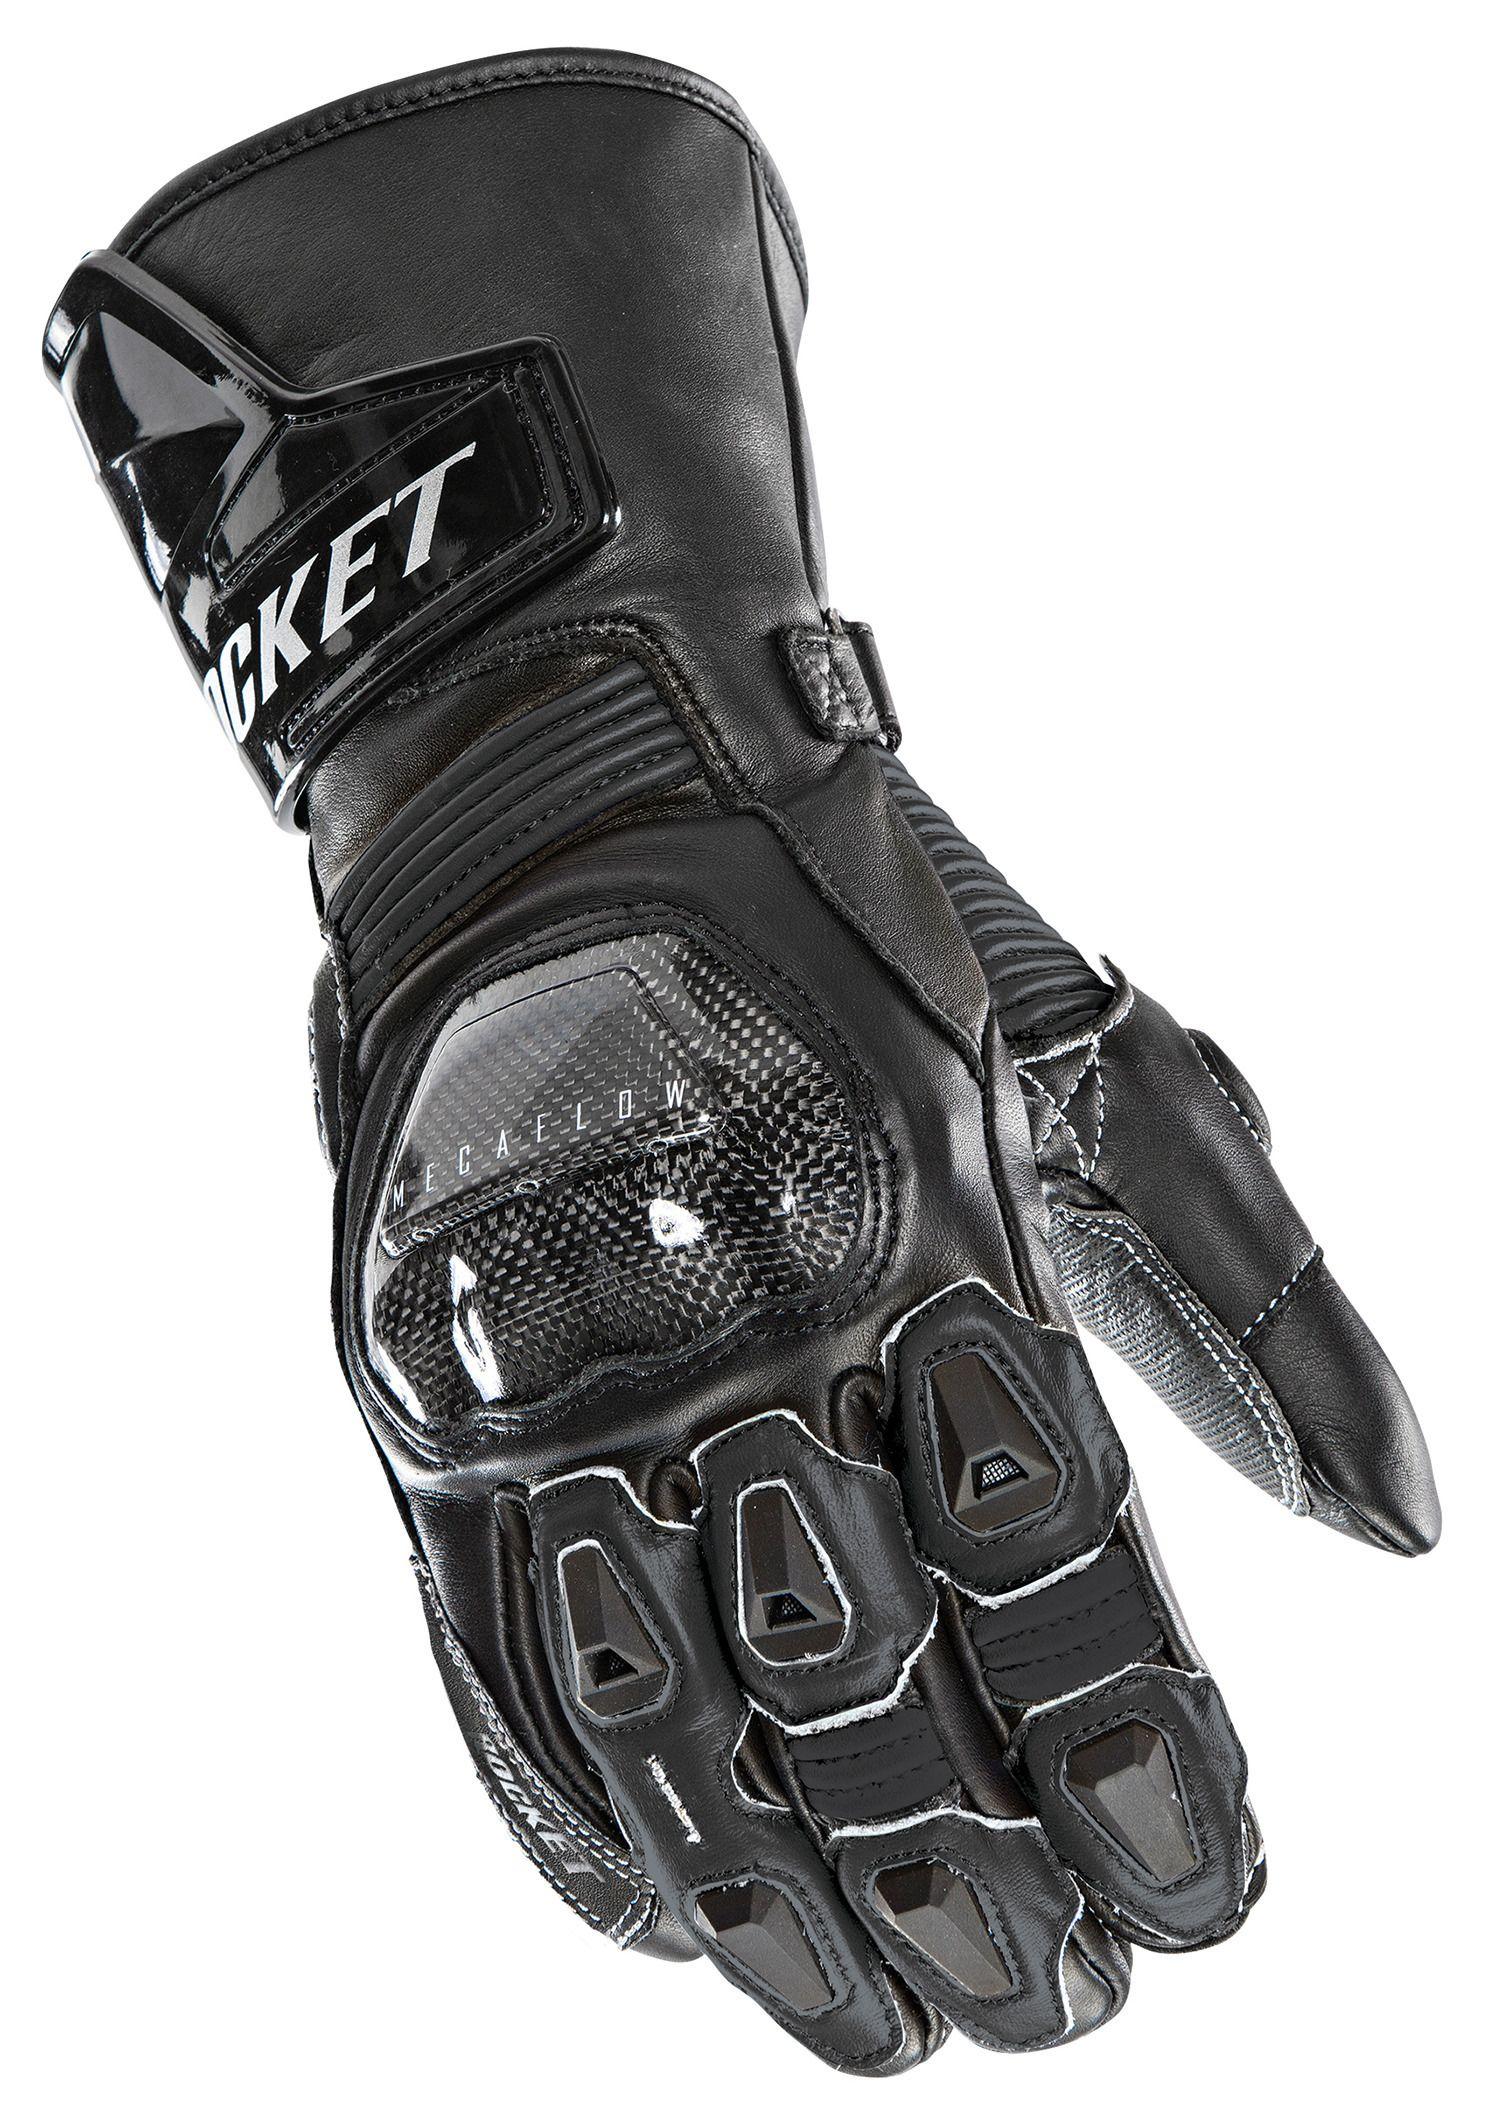 Joe rocket leather motorcycle gloves - Joe Rocket Leather Motorcycle Gloves 38